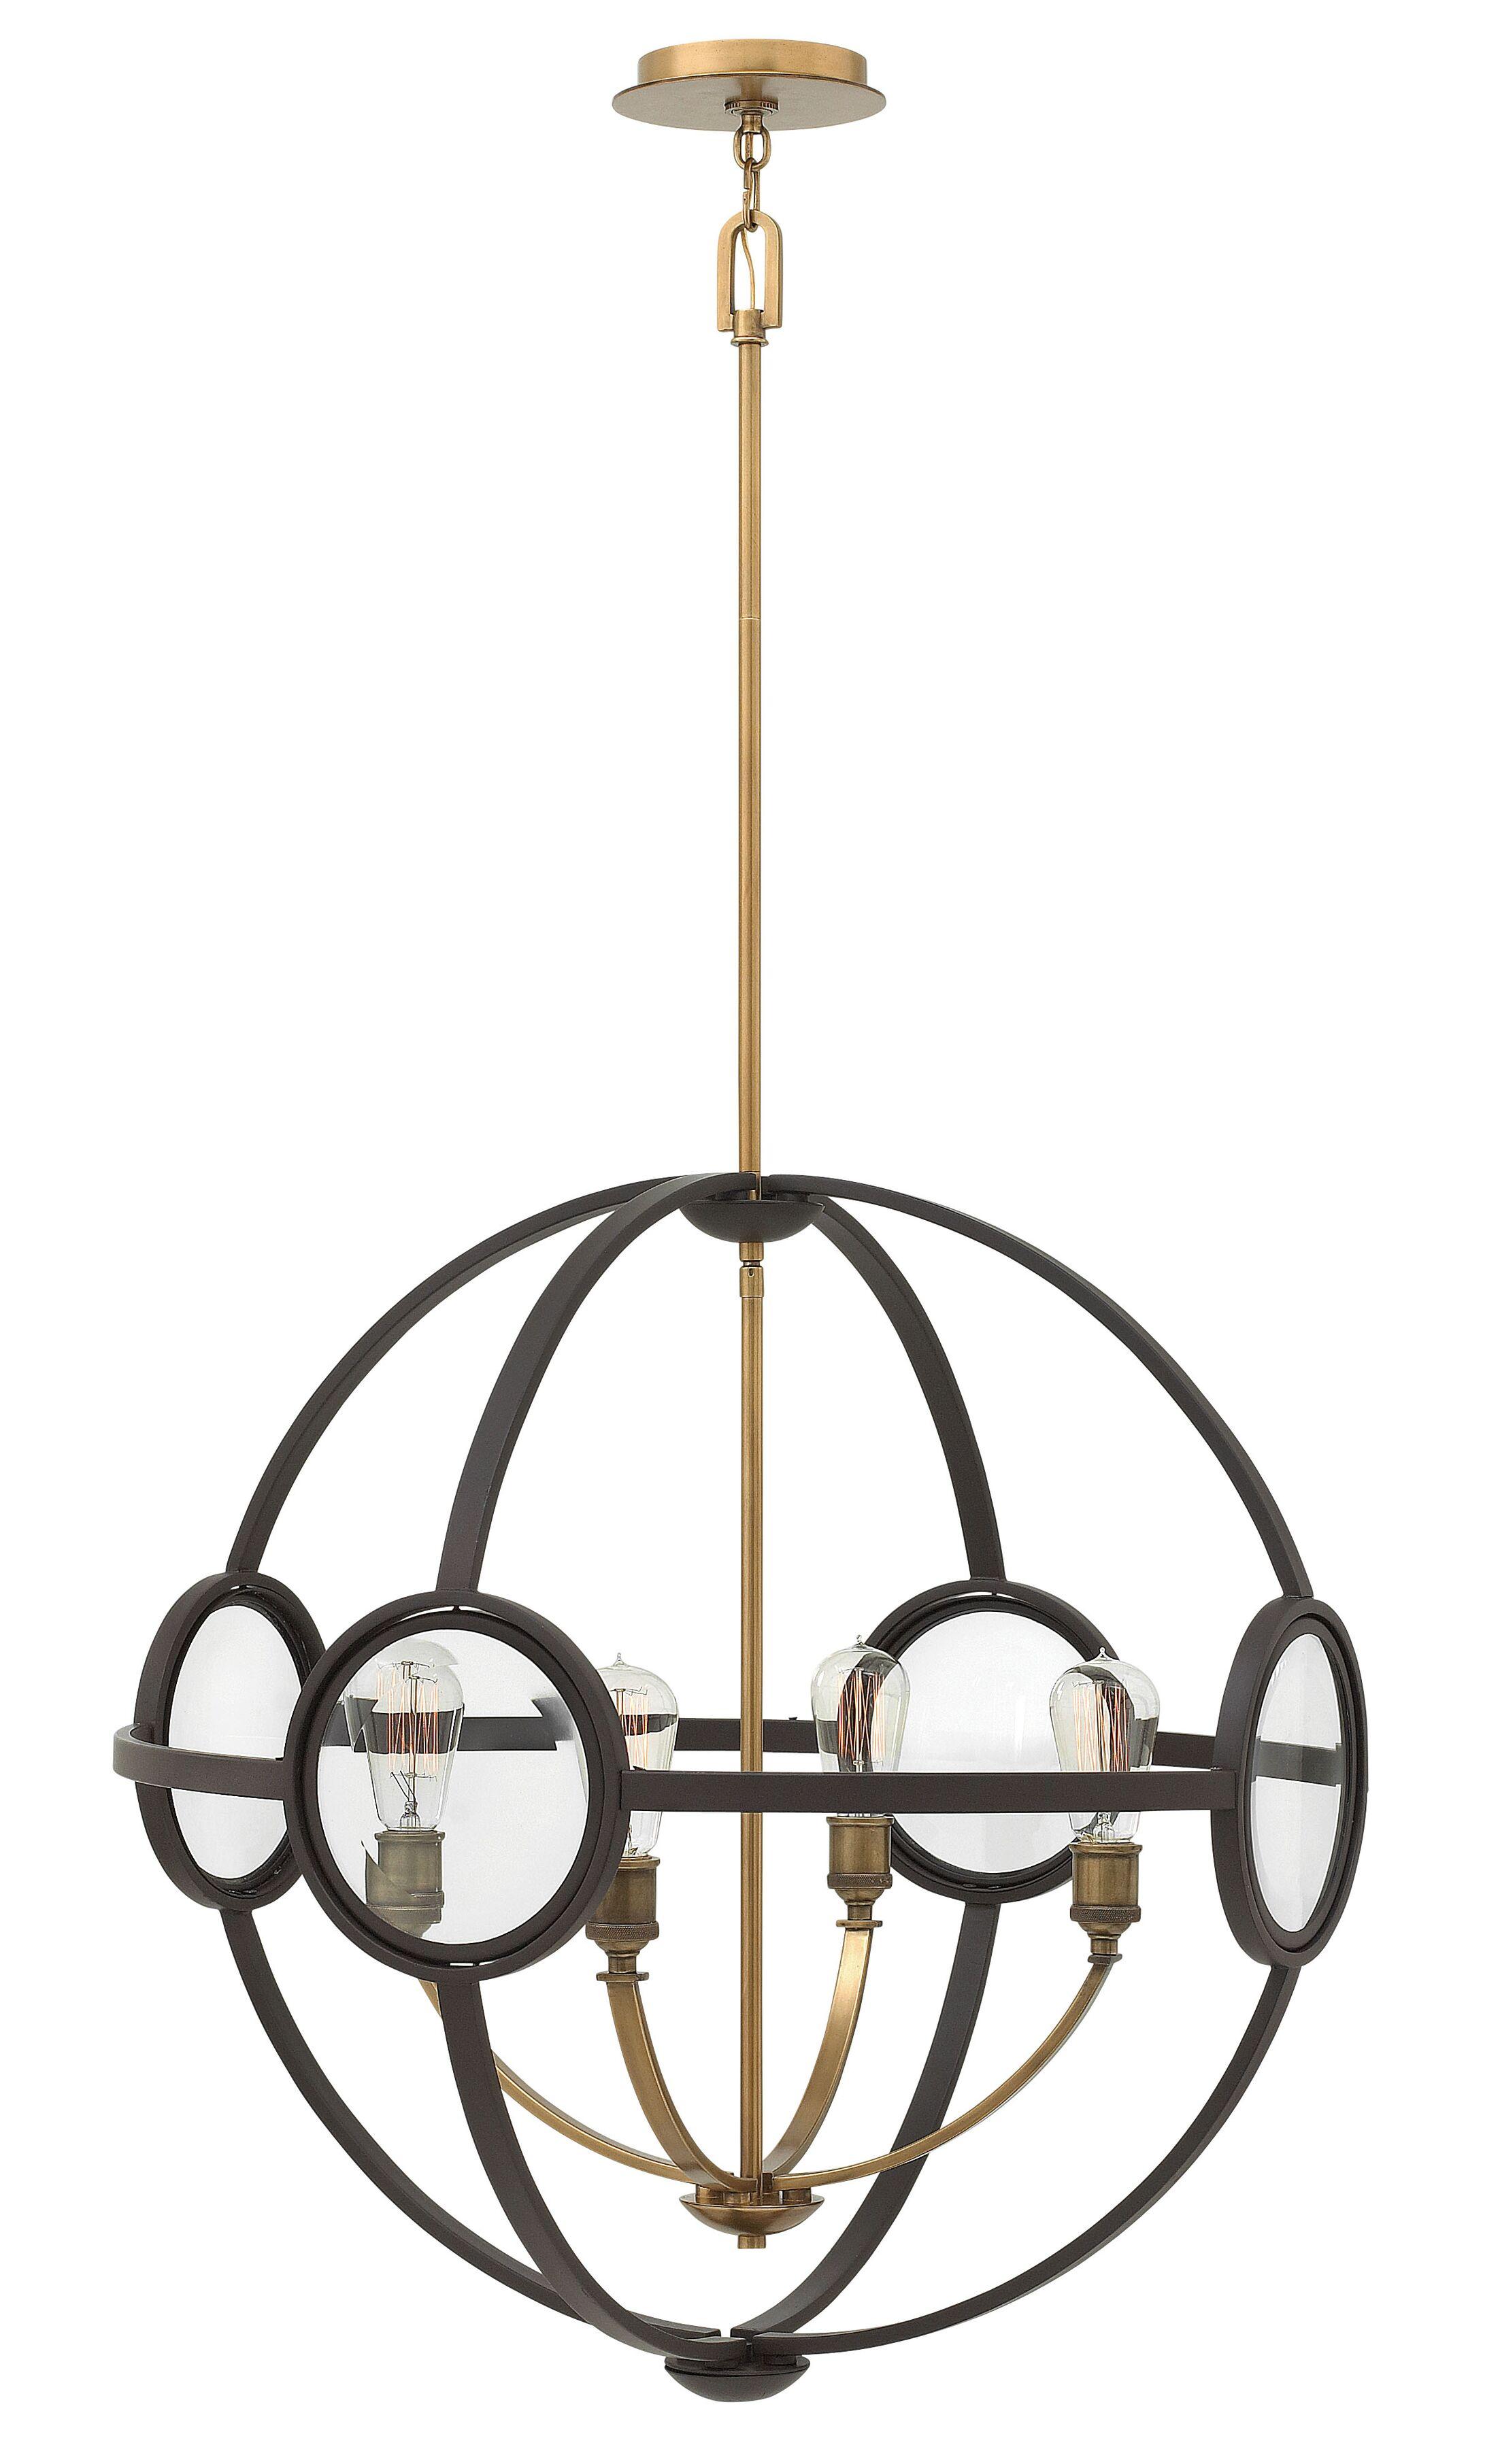 Propes 4-Light Globe Chandelier Finish: Buckeye Bronze